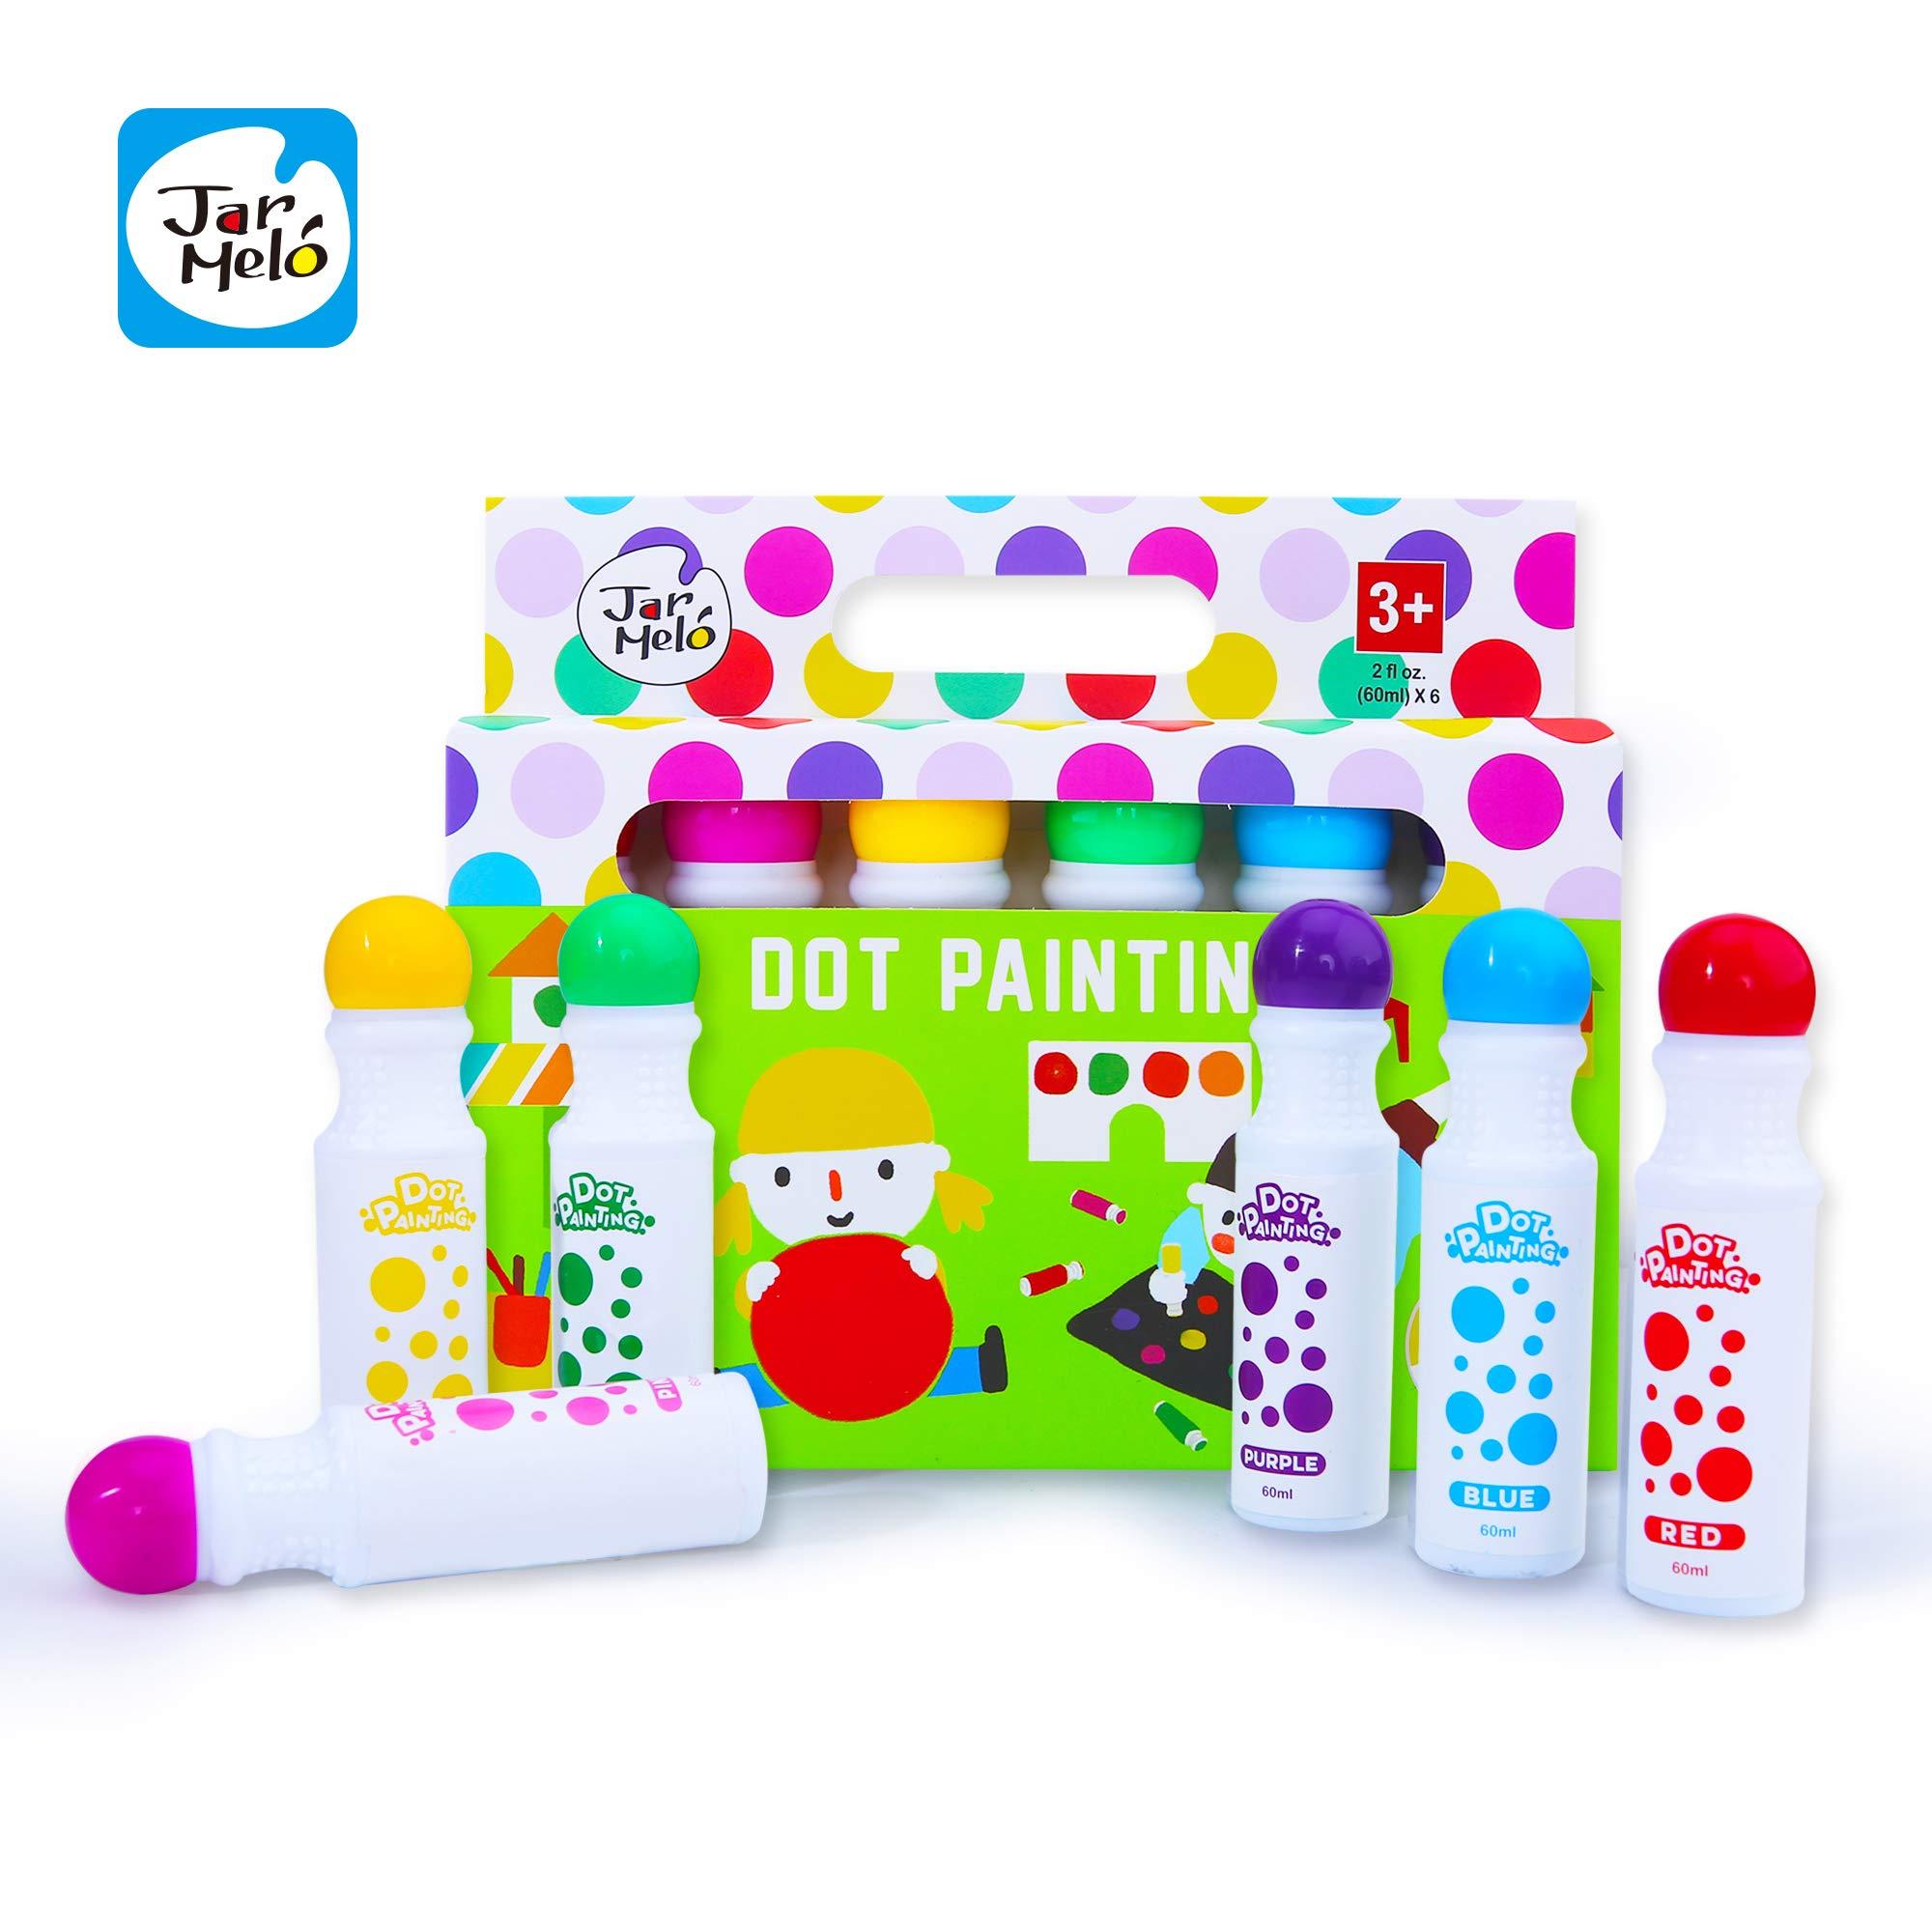 Jar Melo Washable Dot Markers for Kids Preschool Children - 6 Colors; Rainbow Washable Paint Markers